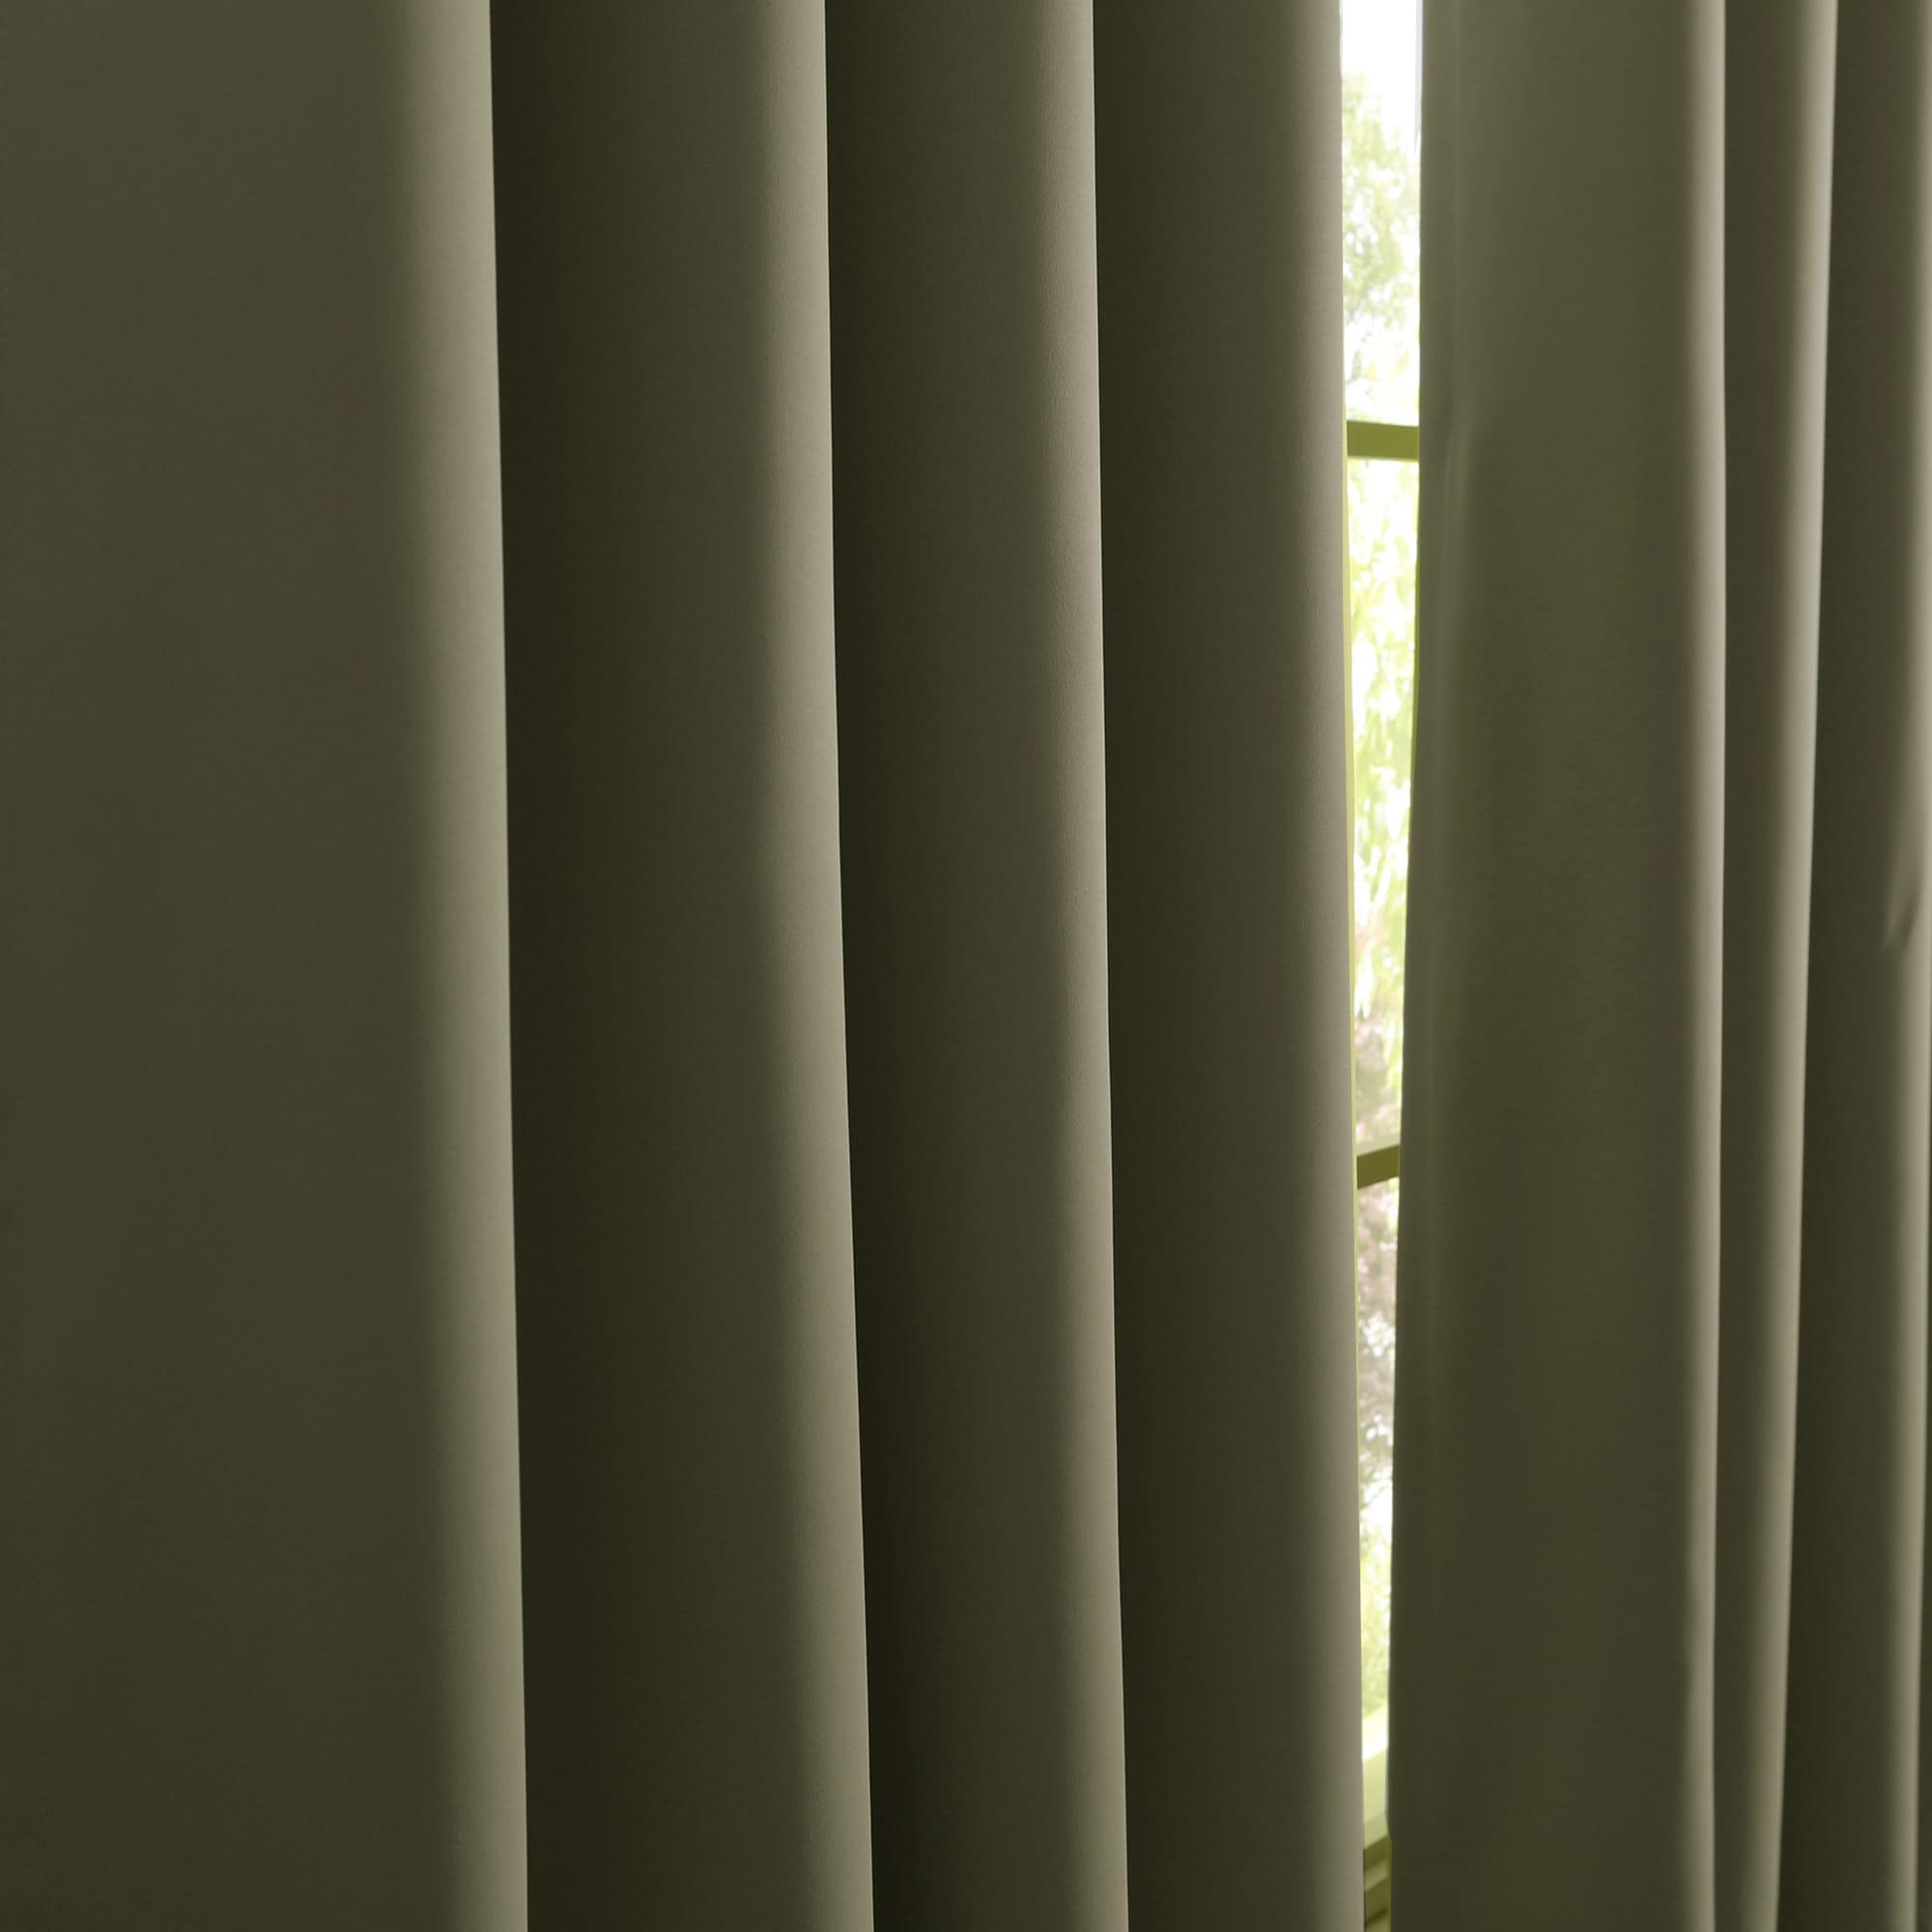 olive decor furniture greenrooms curtains decorations brockschmidt advice walls ideas design green color curtain decorate paint